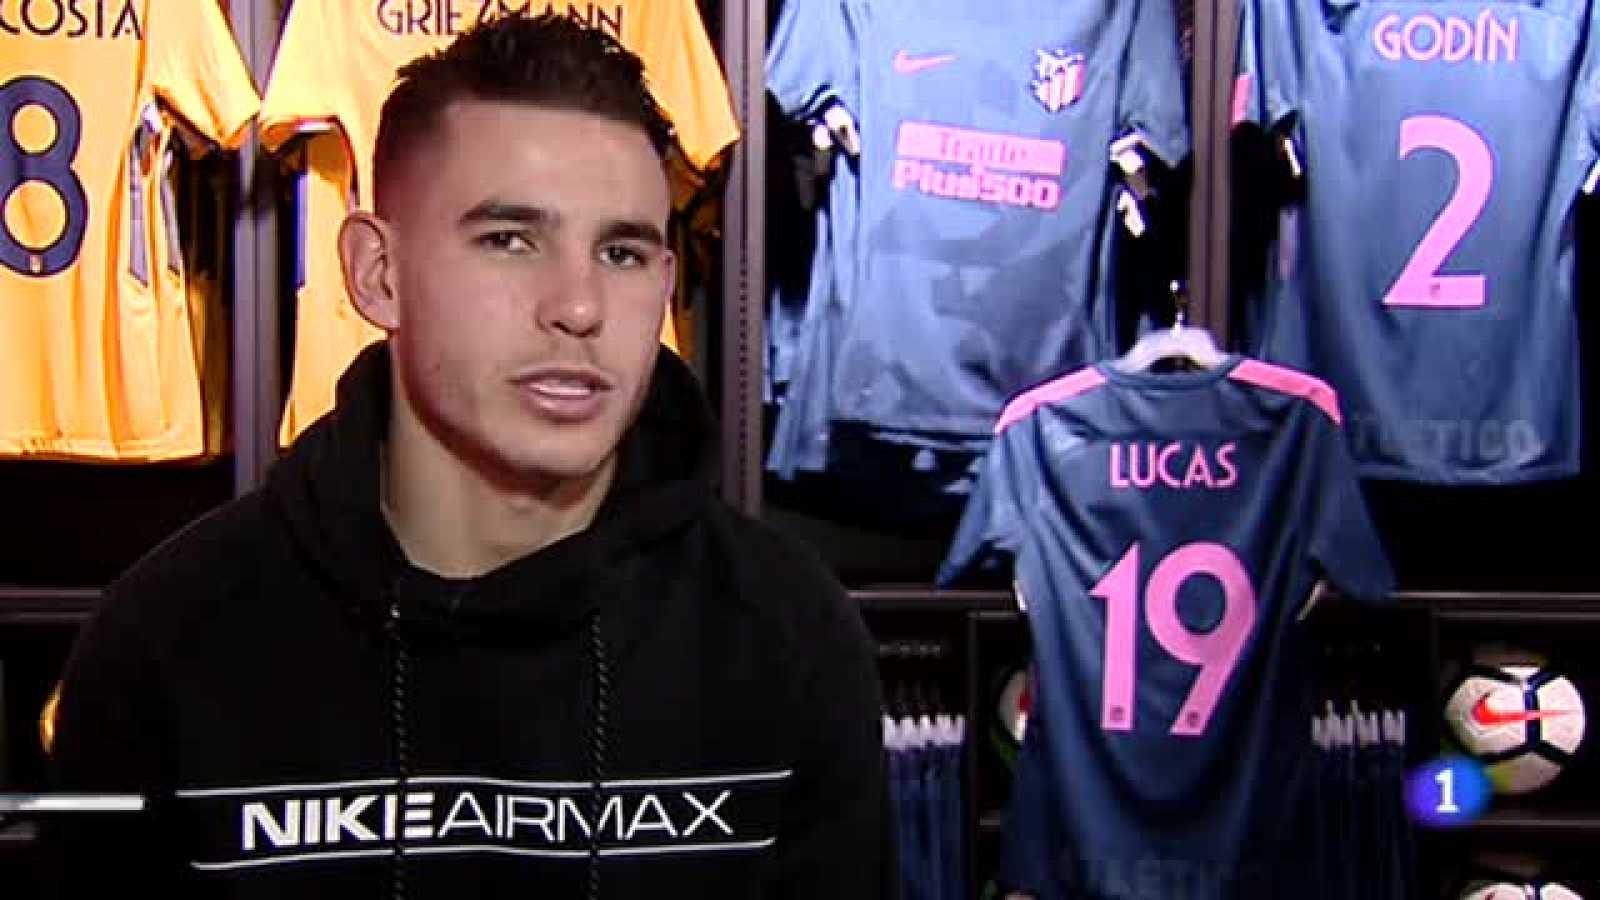 OFFICIEL : Lucas Hernandez (Atlético de Madrid) va rejoindre le Bayern Munich